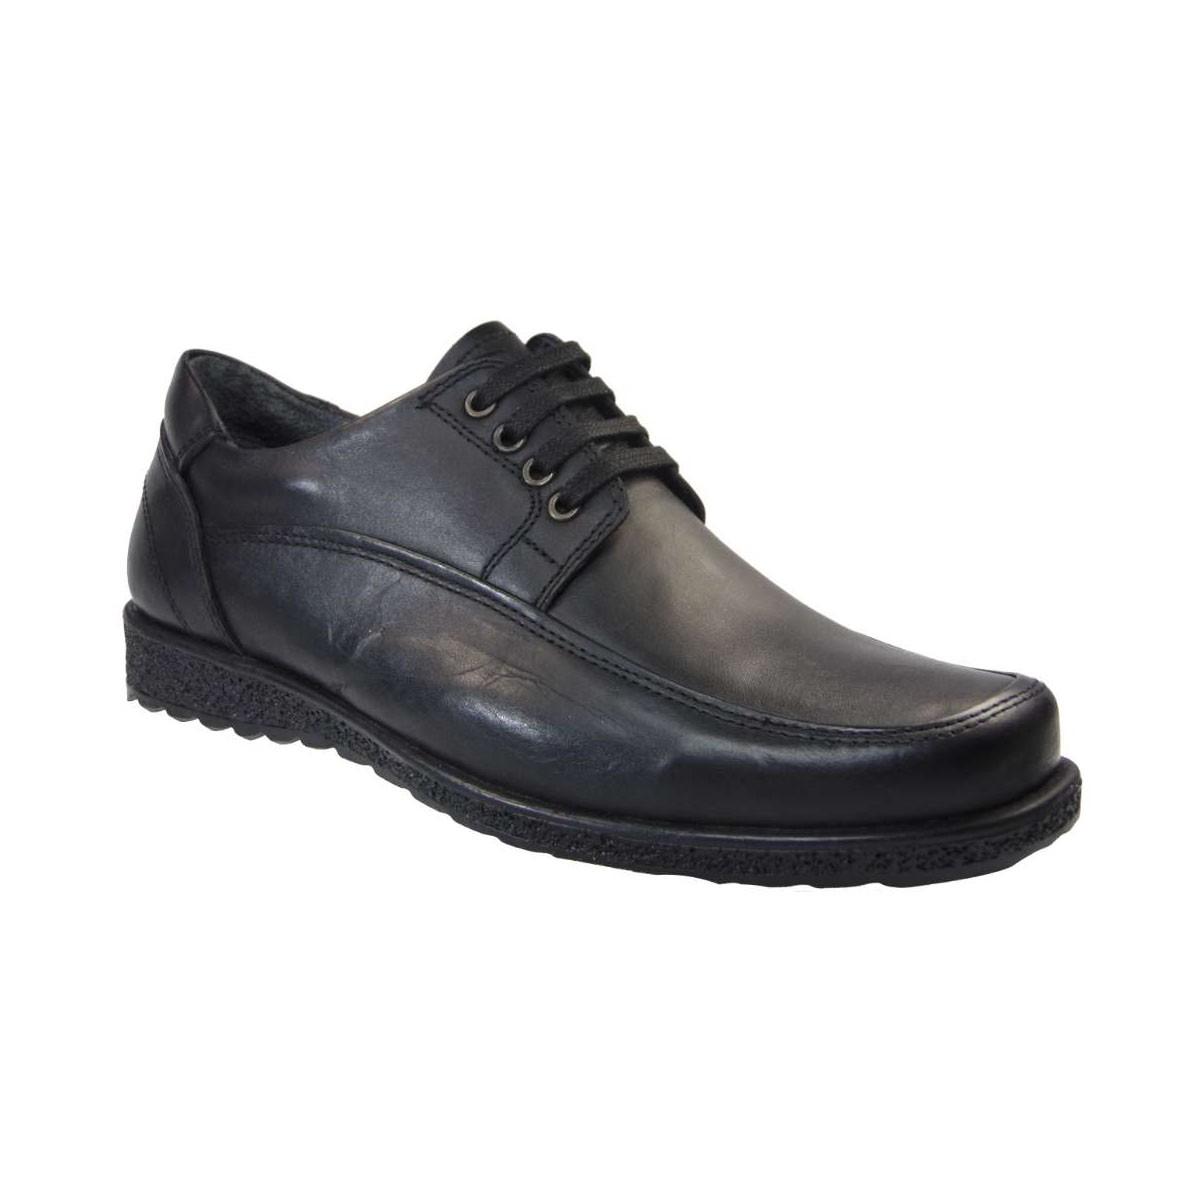 Tsimpolis Shoes 886 Ανδρικό Δετό Δερμάτινο Μαύρο  28e6f87472c